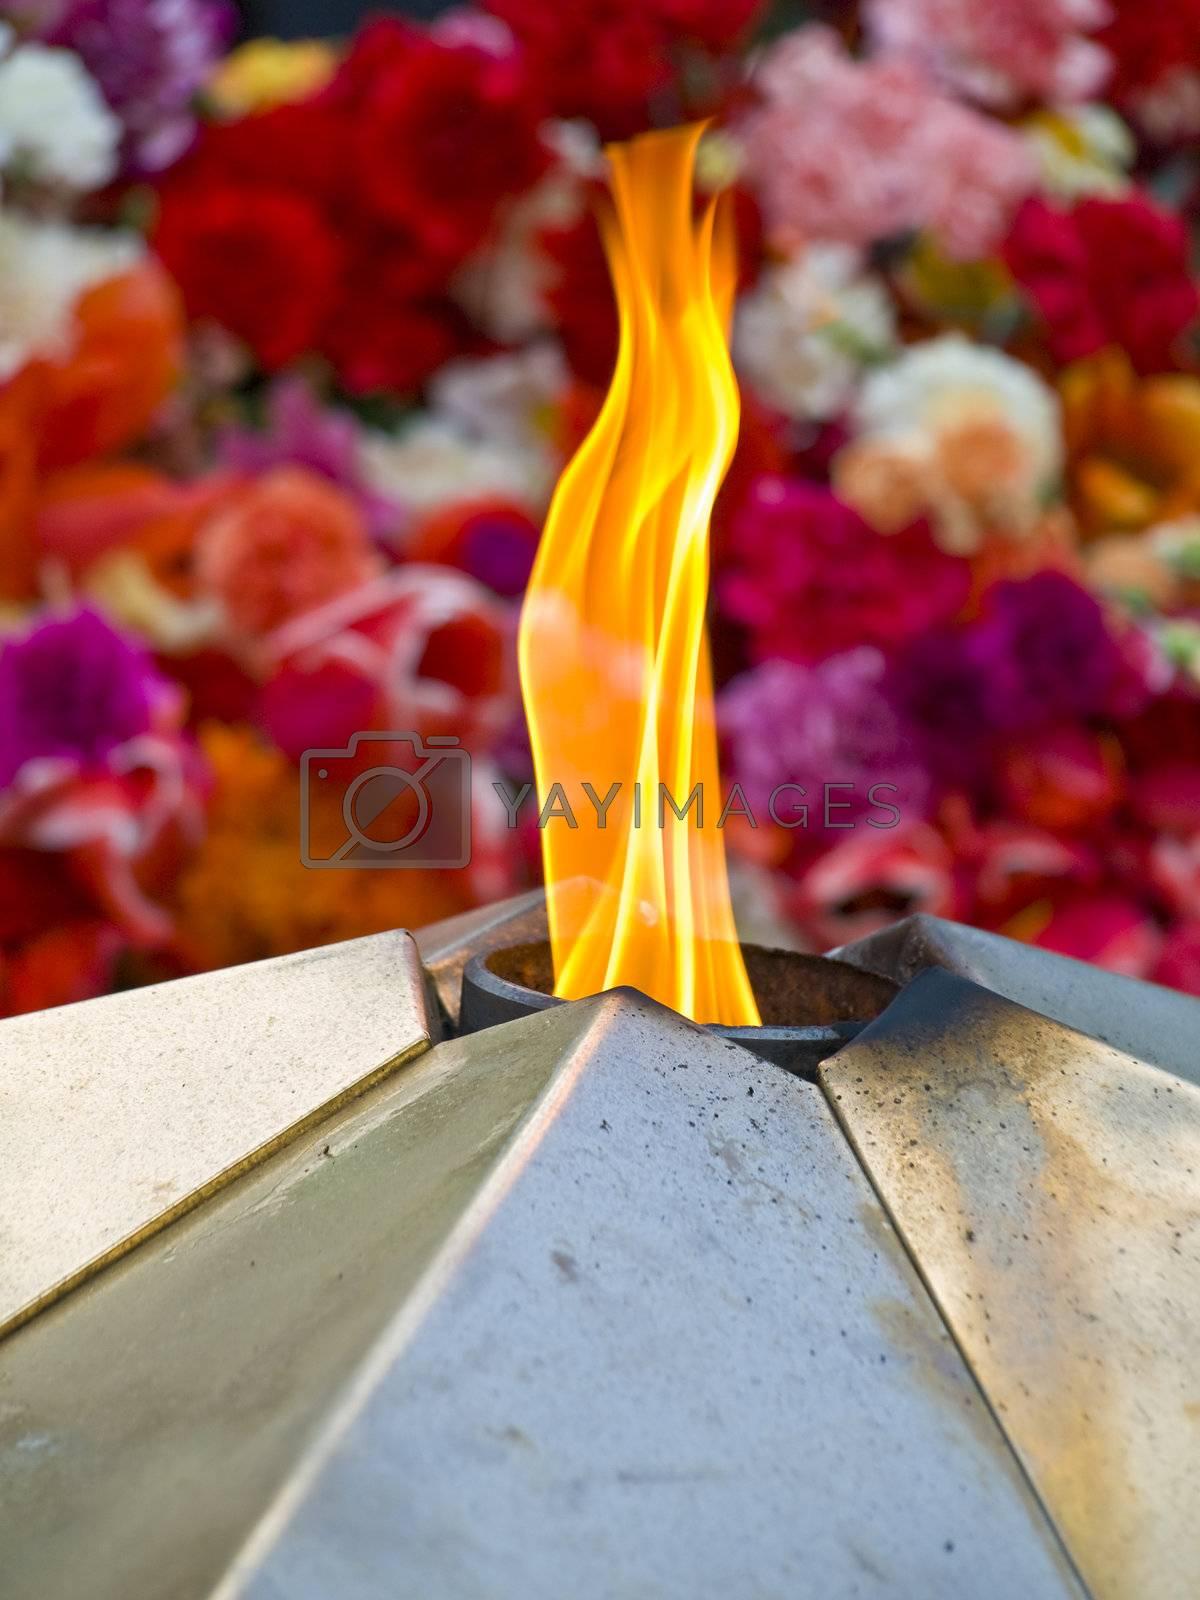 eternal light against the multicolored flowers